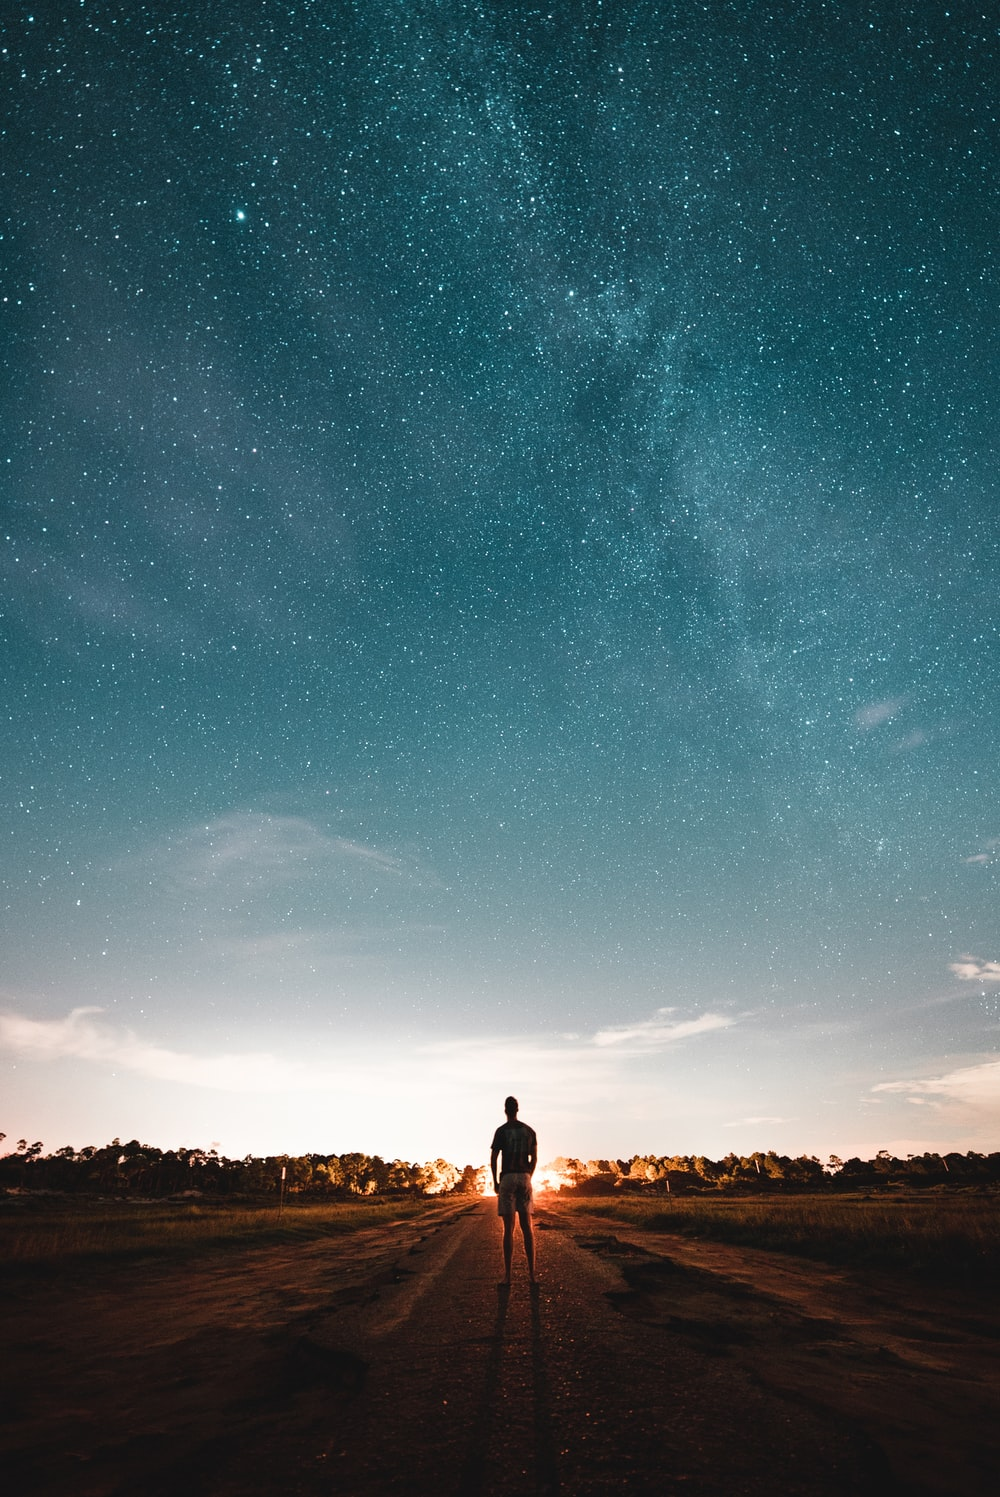 silhouette photo of man under star full sky